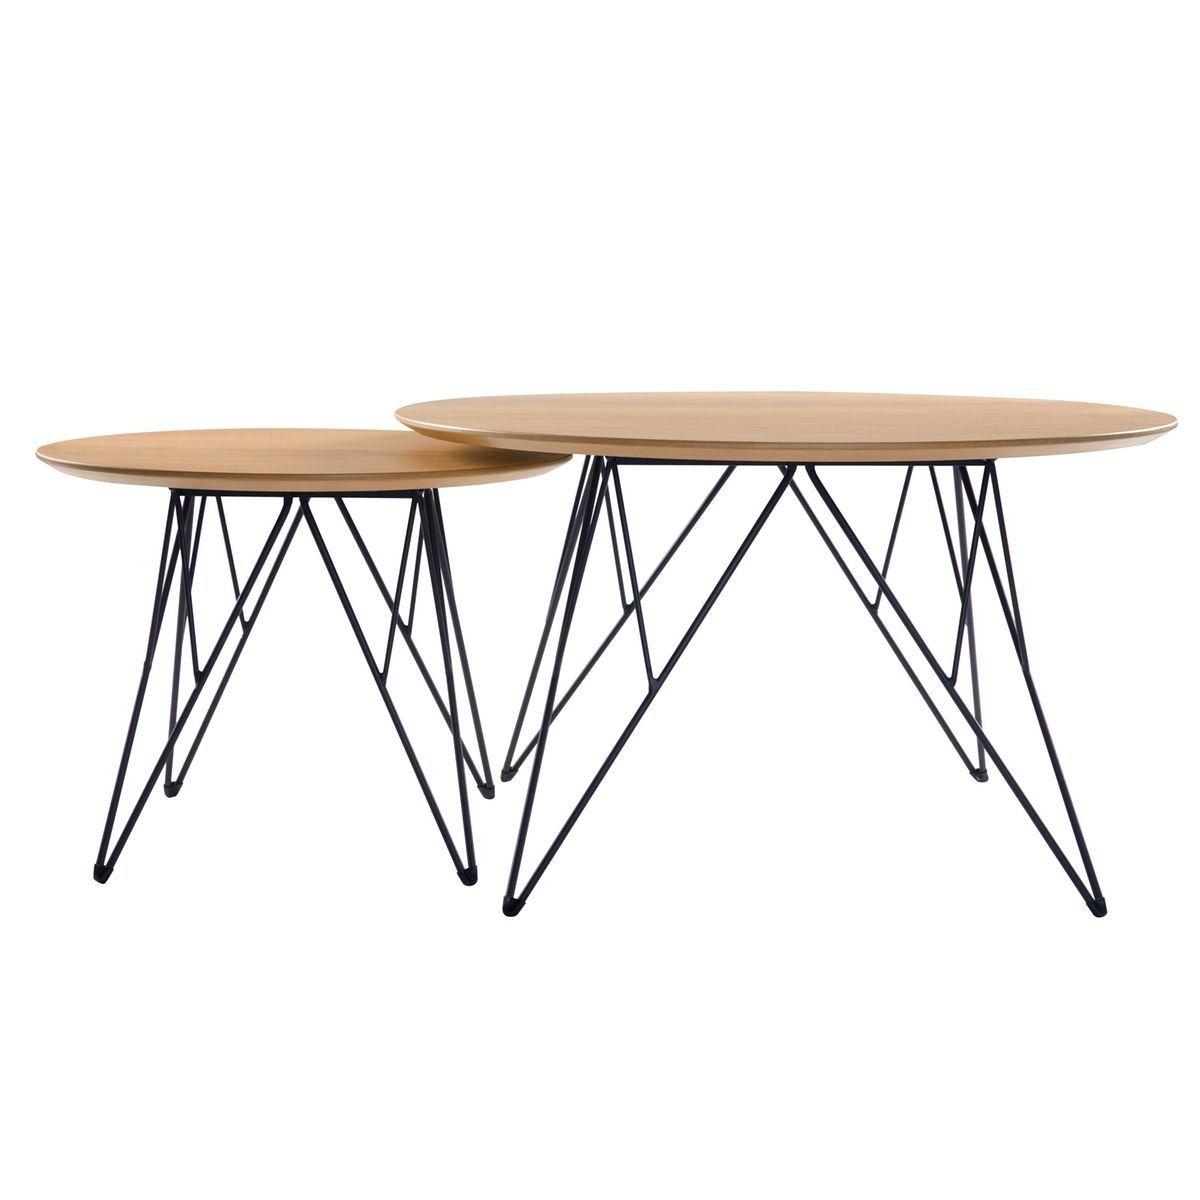 2019 Table 2Products de Karilot gigogne en basse 0kNPnX8wO